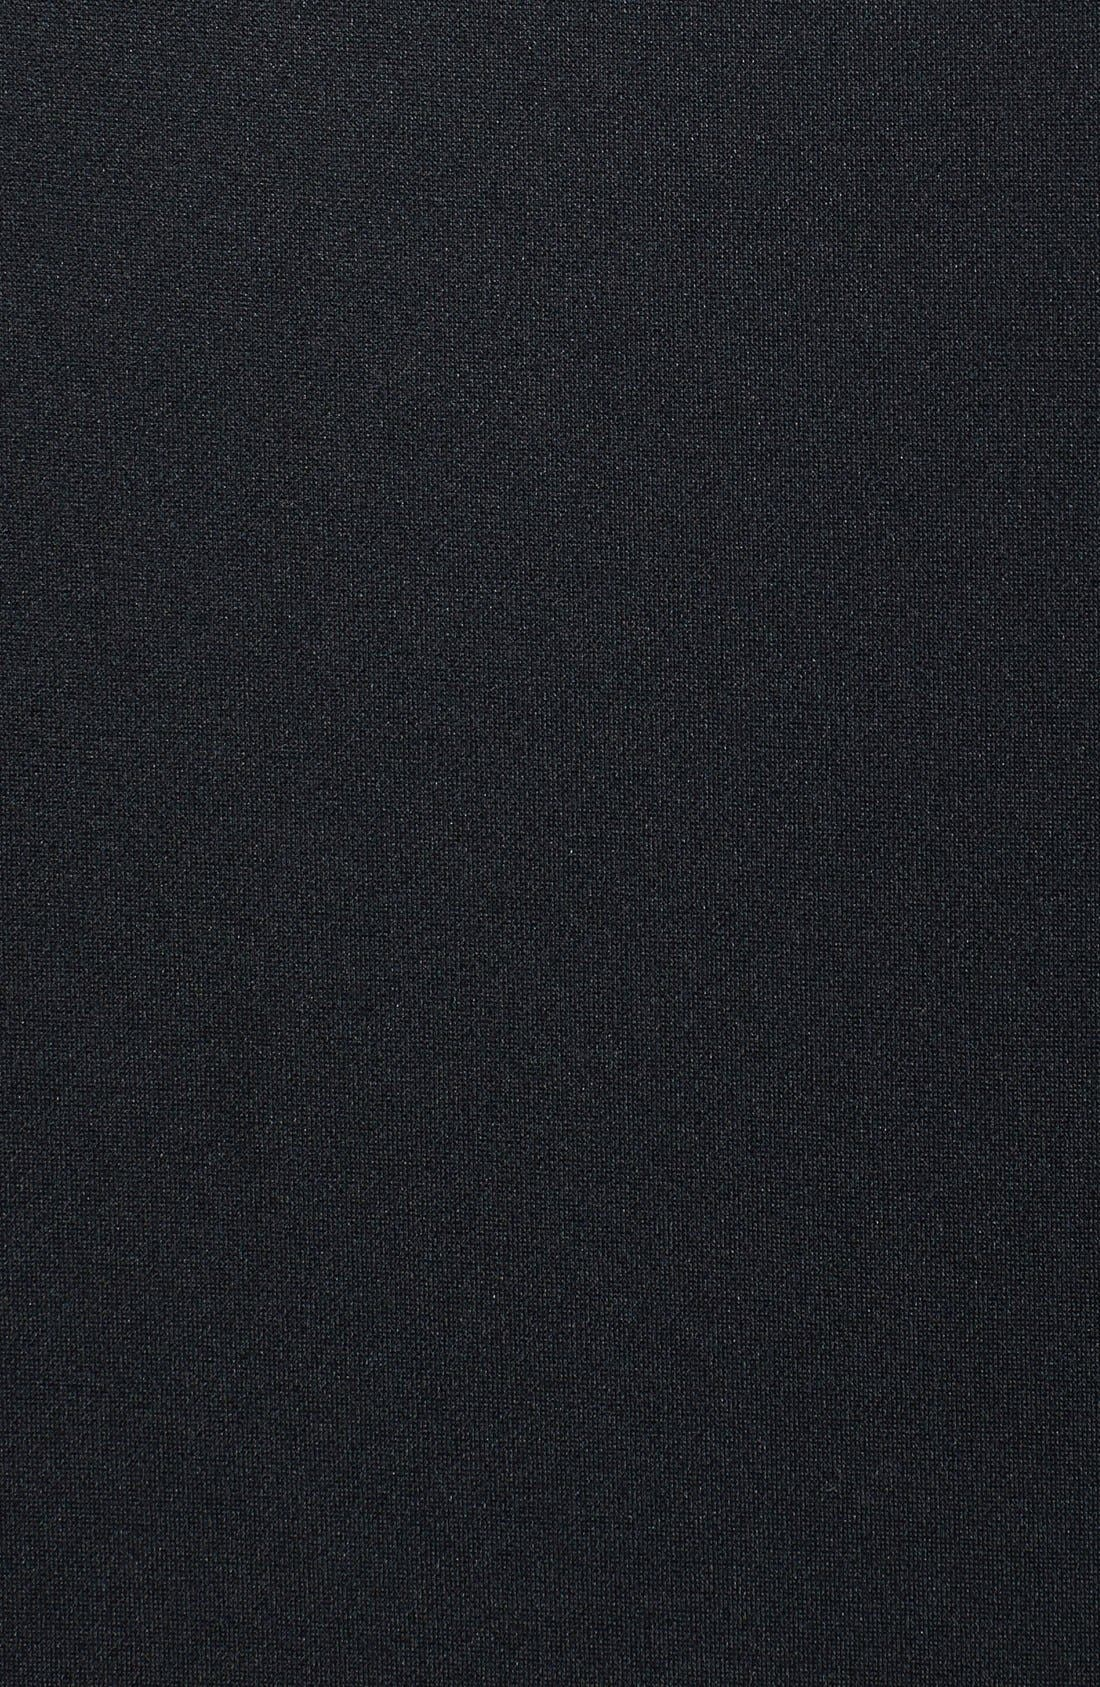 Alternate Image 3  - The North Face 'Denoff' Full Zip Hoodie